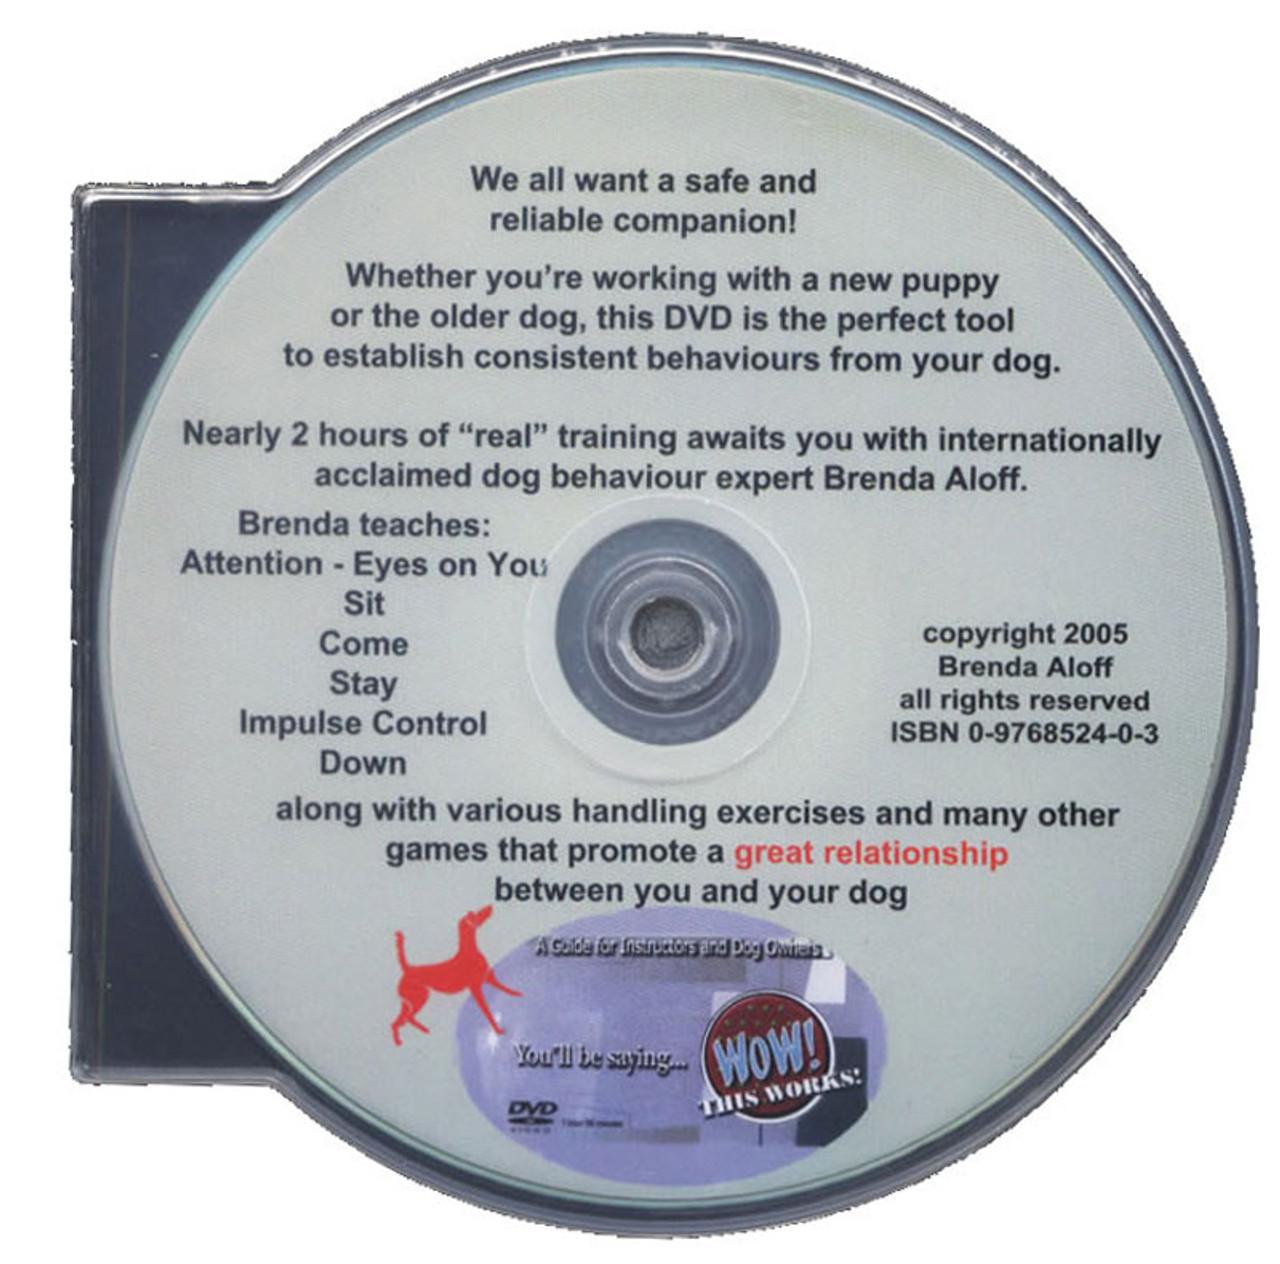 Brenda Aloff's Fundamentals - Foundation Training for Every Dog Dvd